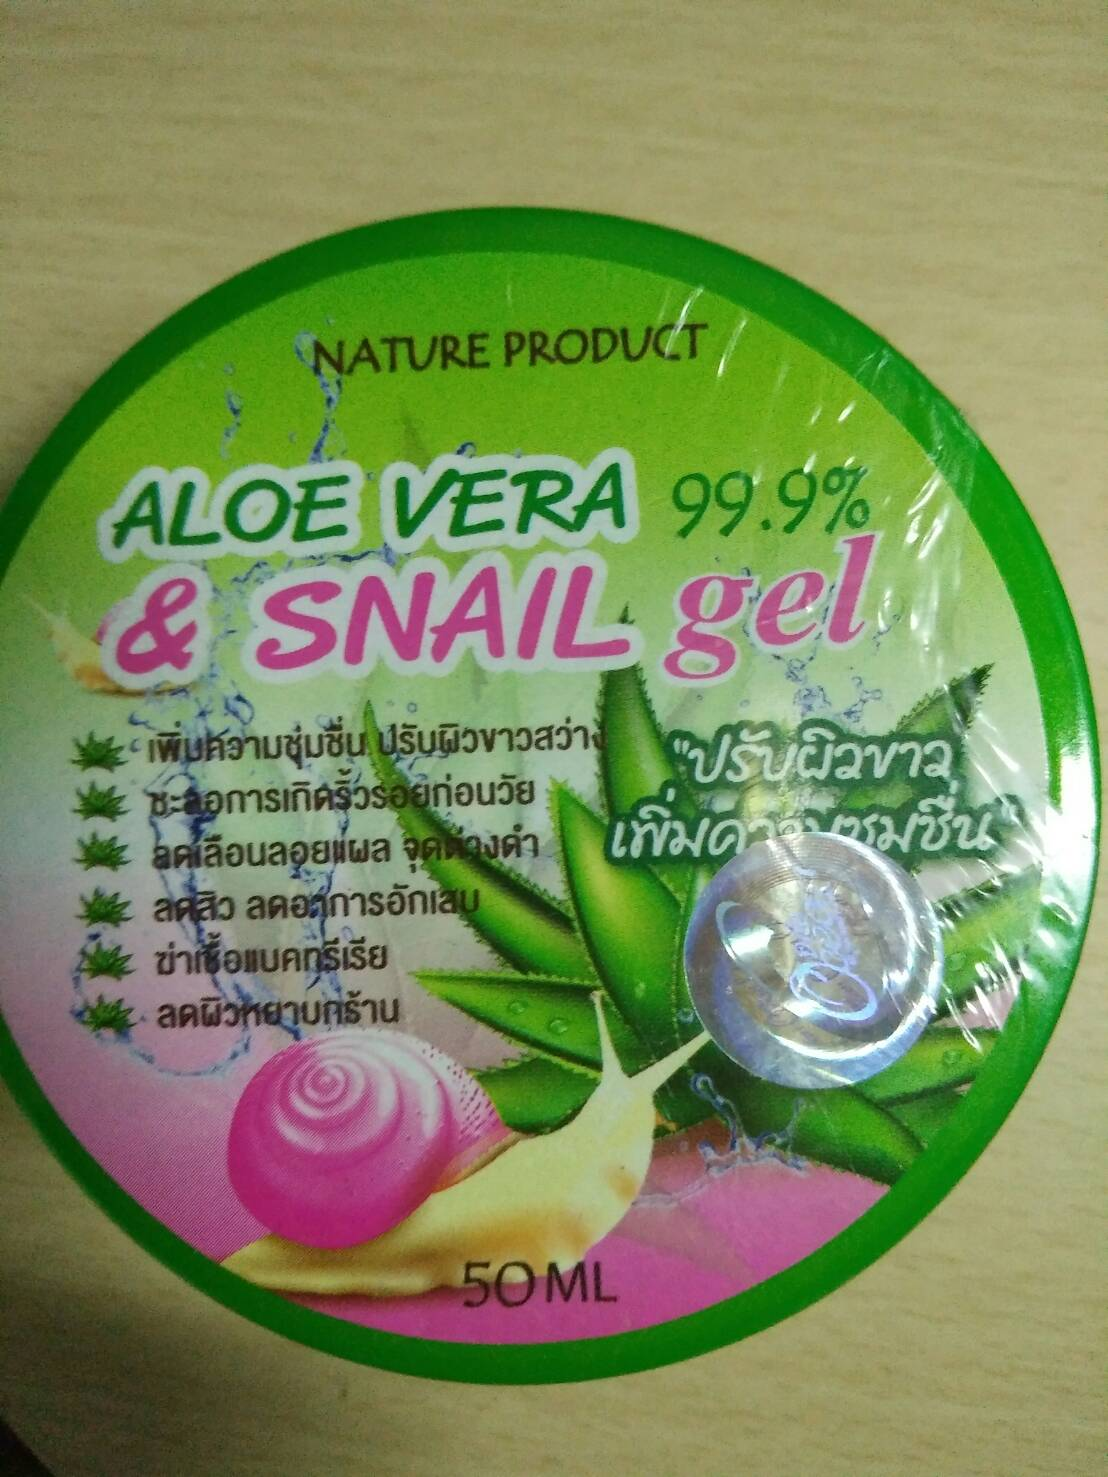 ALOE VERA 99.9% & SNAIL gel เจลอโลเวล่าผสมเมือกหอยทาก ปรับผิวขาวเพิ่มความชุ่มชื่น